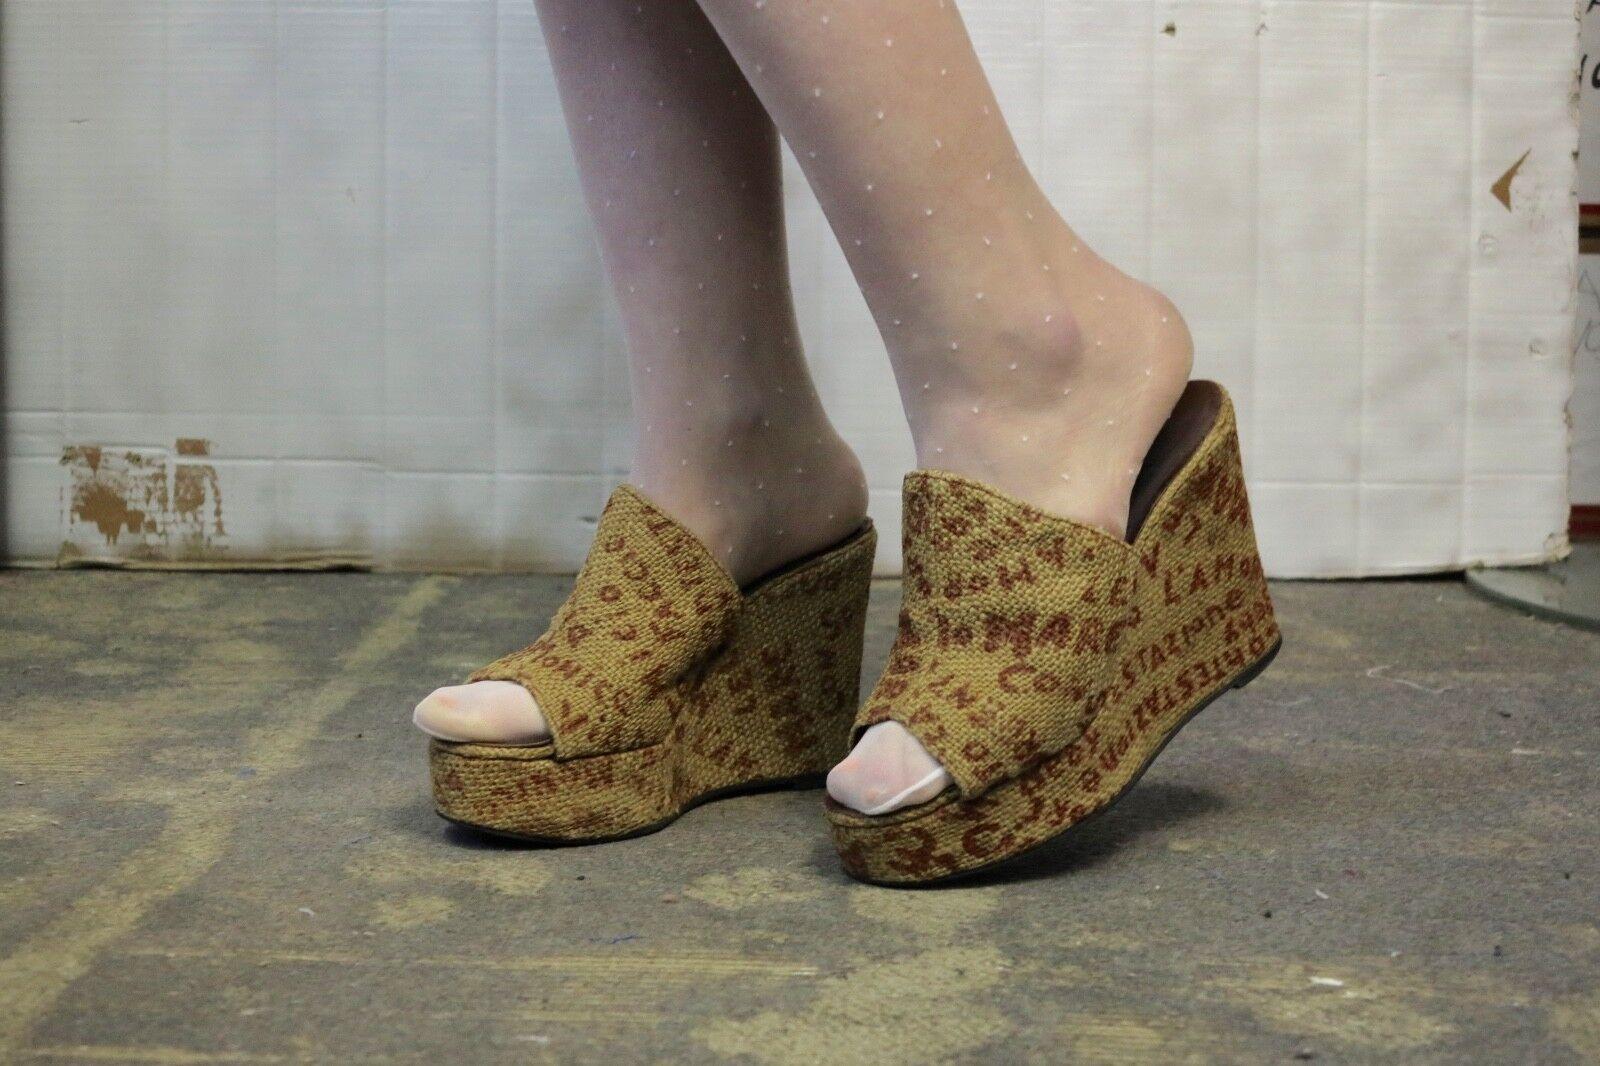 Plateauschuhe Sandalen made in  Bast Mare 70er TRUEVINTAGE 70s sandals